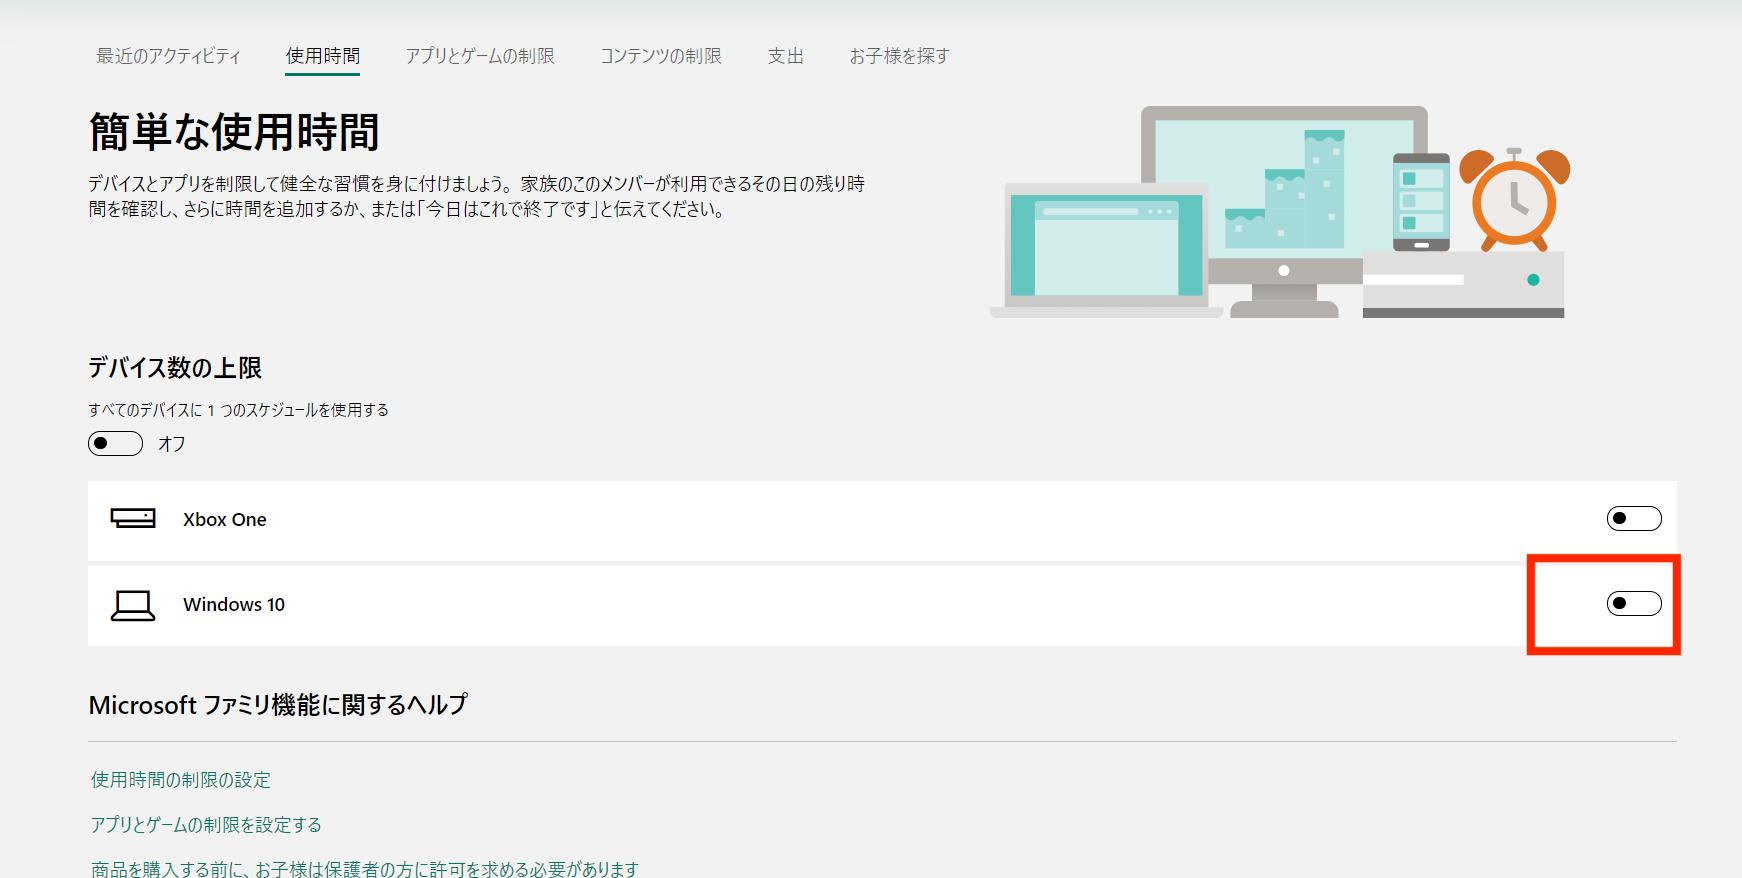 【Windows】ファミリー機能の使い方5